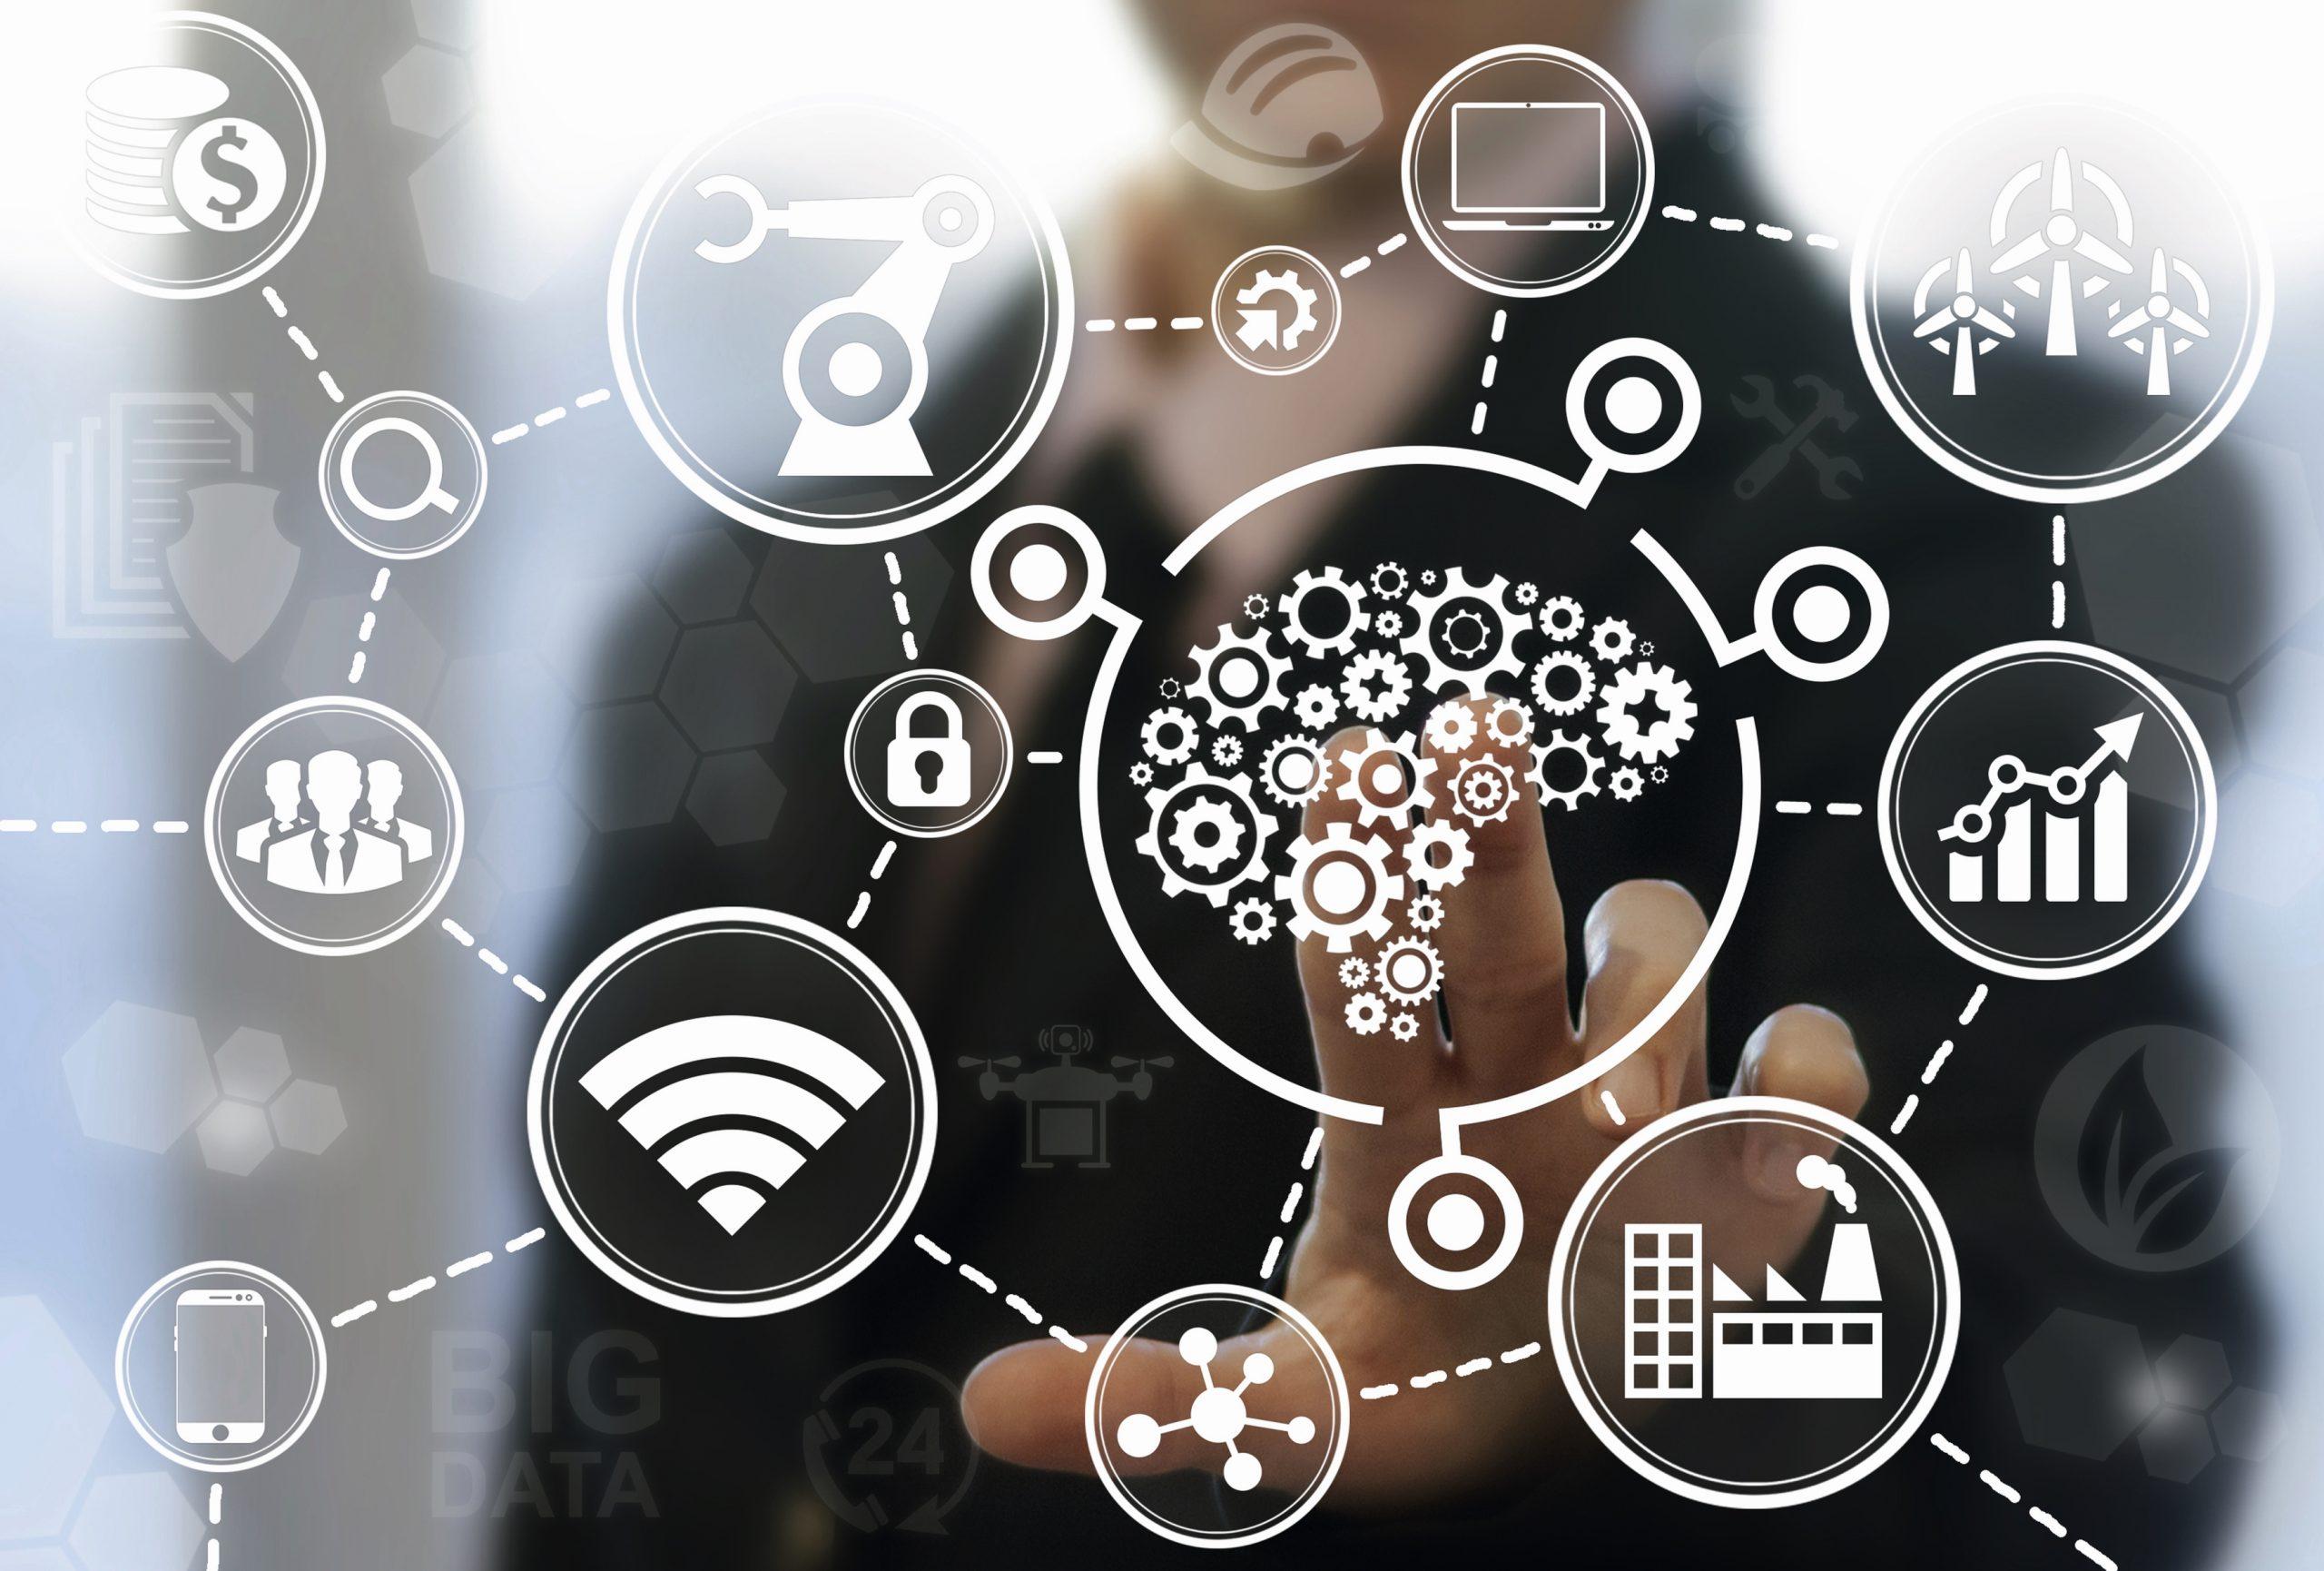 Daten vor Ort auswerten, autonom reagieren